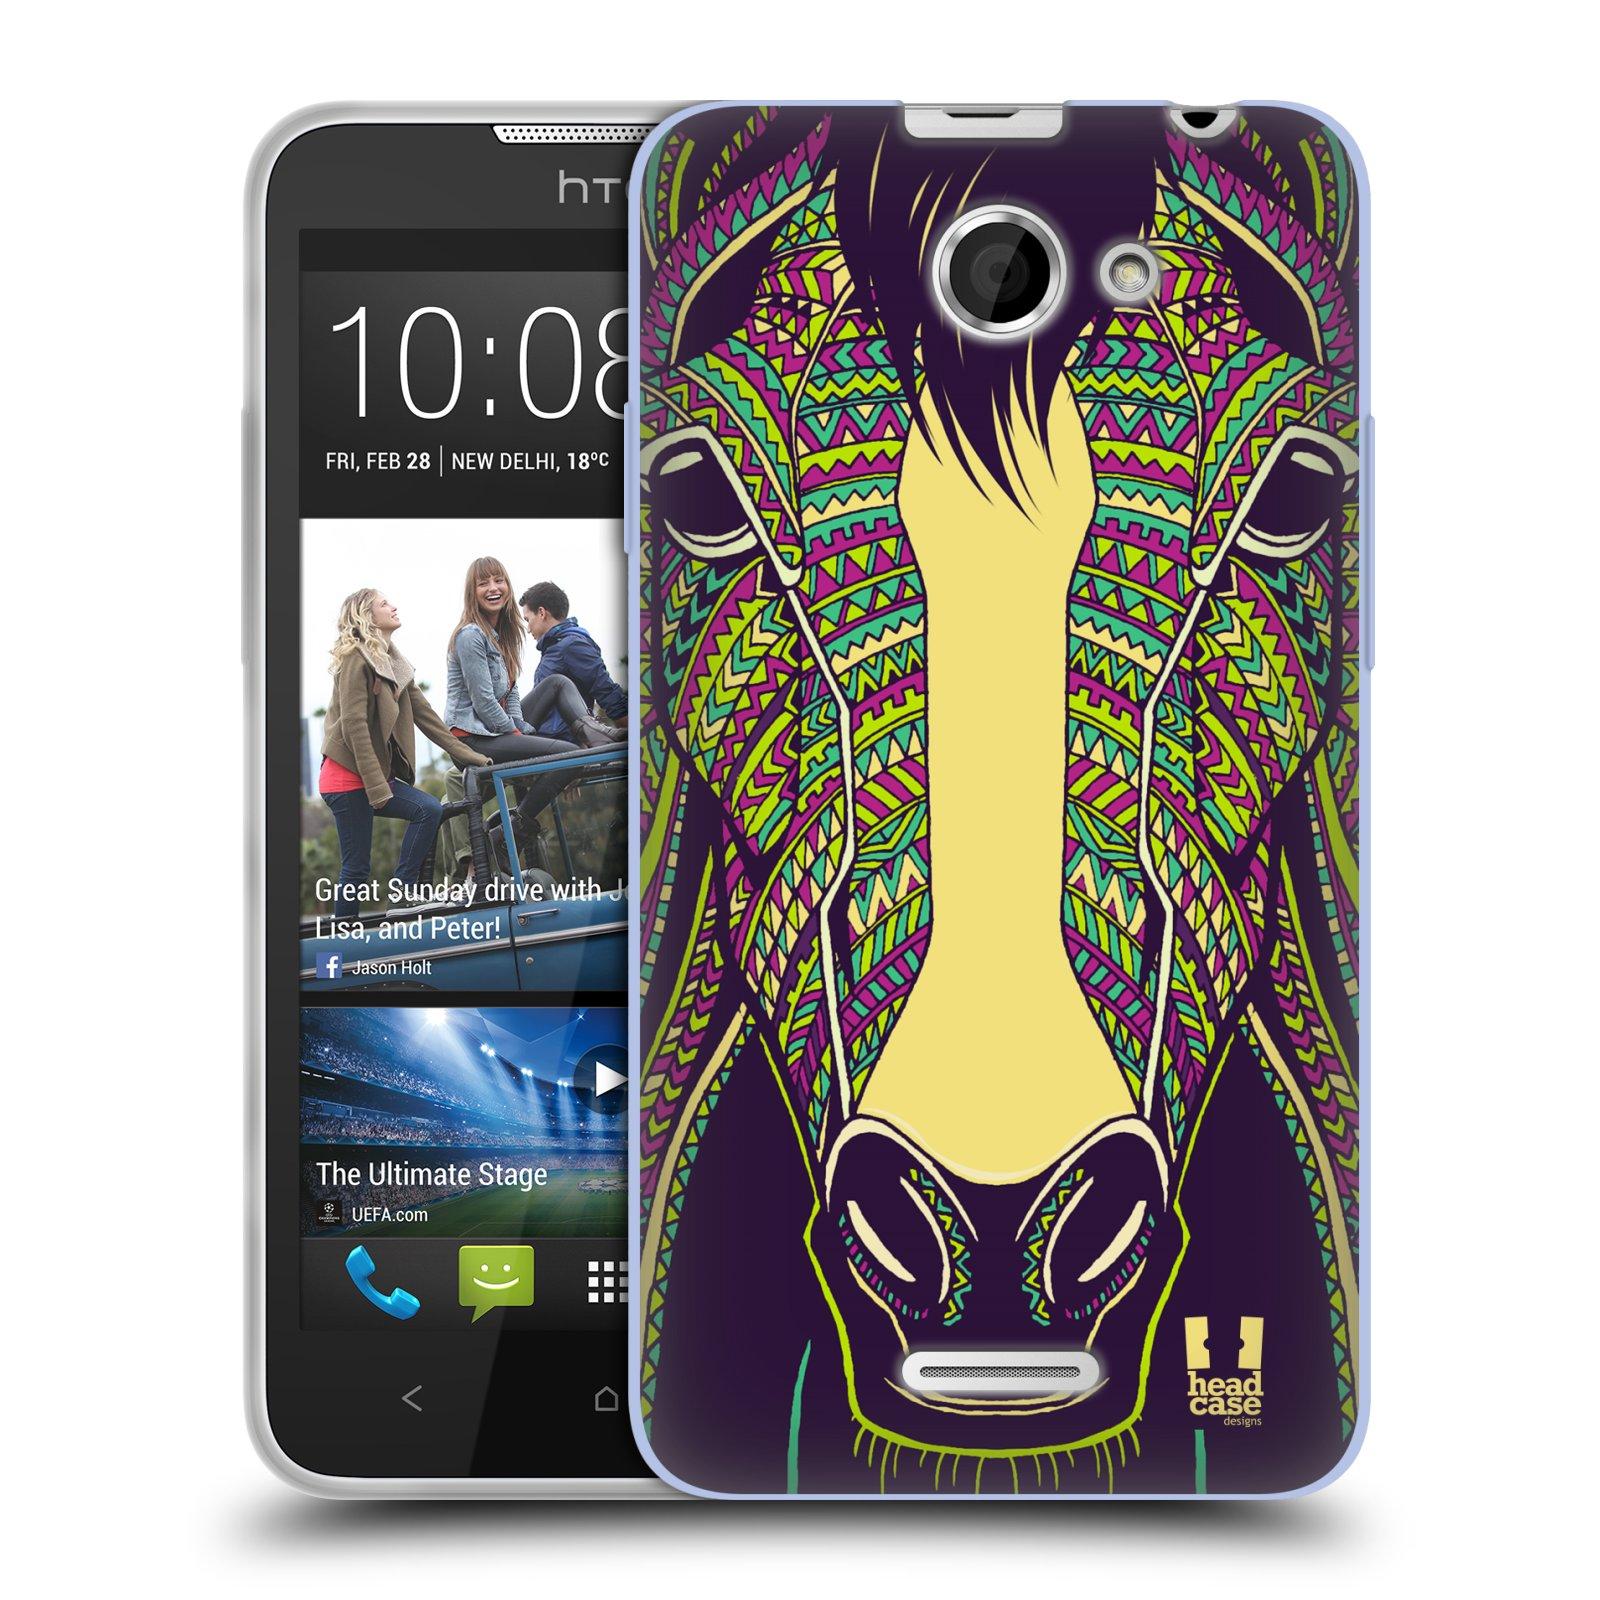 Silikonové pouzdro na mobil HTC Desire 516 HEAD CASE AZTEC KŮŇ (Silikonový kryt či obal na mobilní telefon HTC Desire 516 Dual SIM)